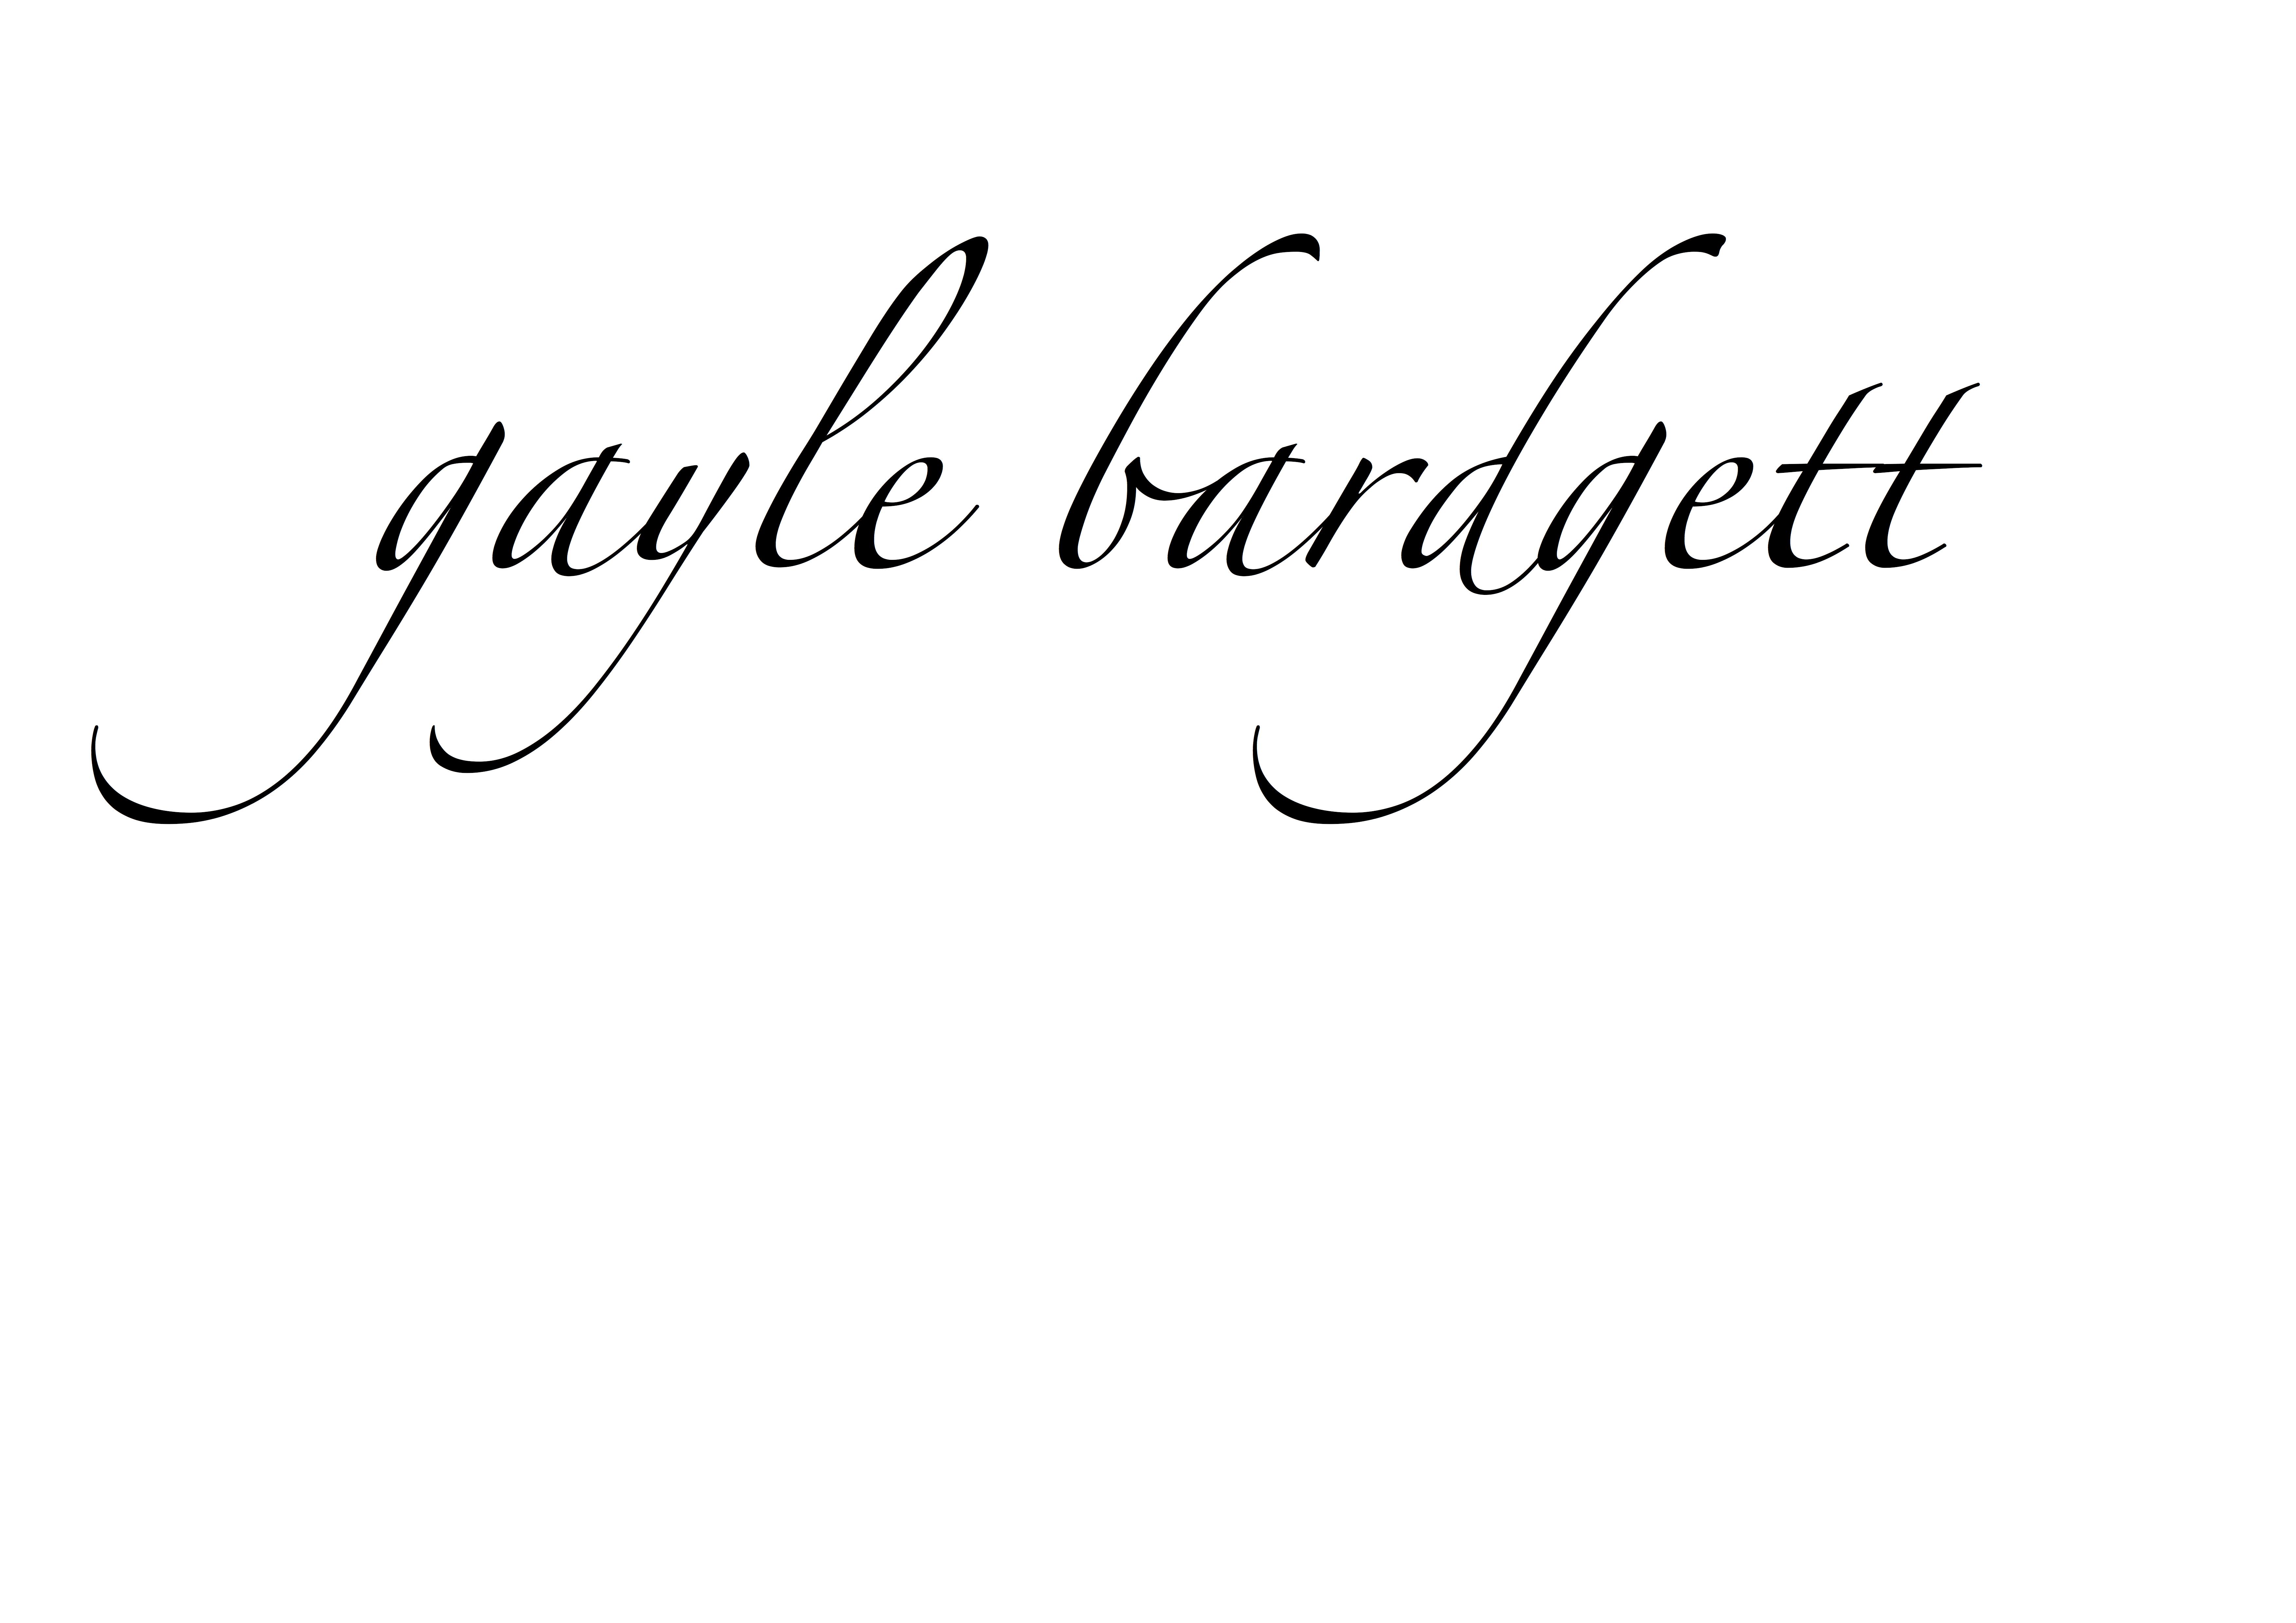 Gayle Bardgett's Signature